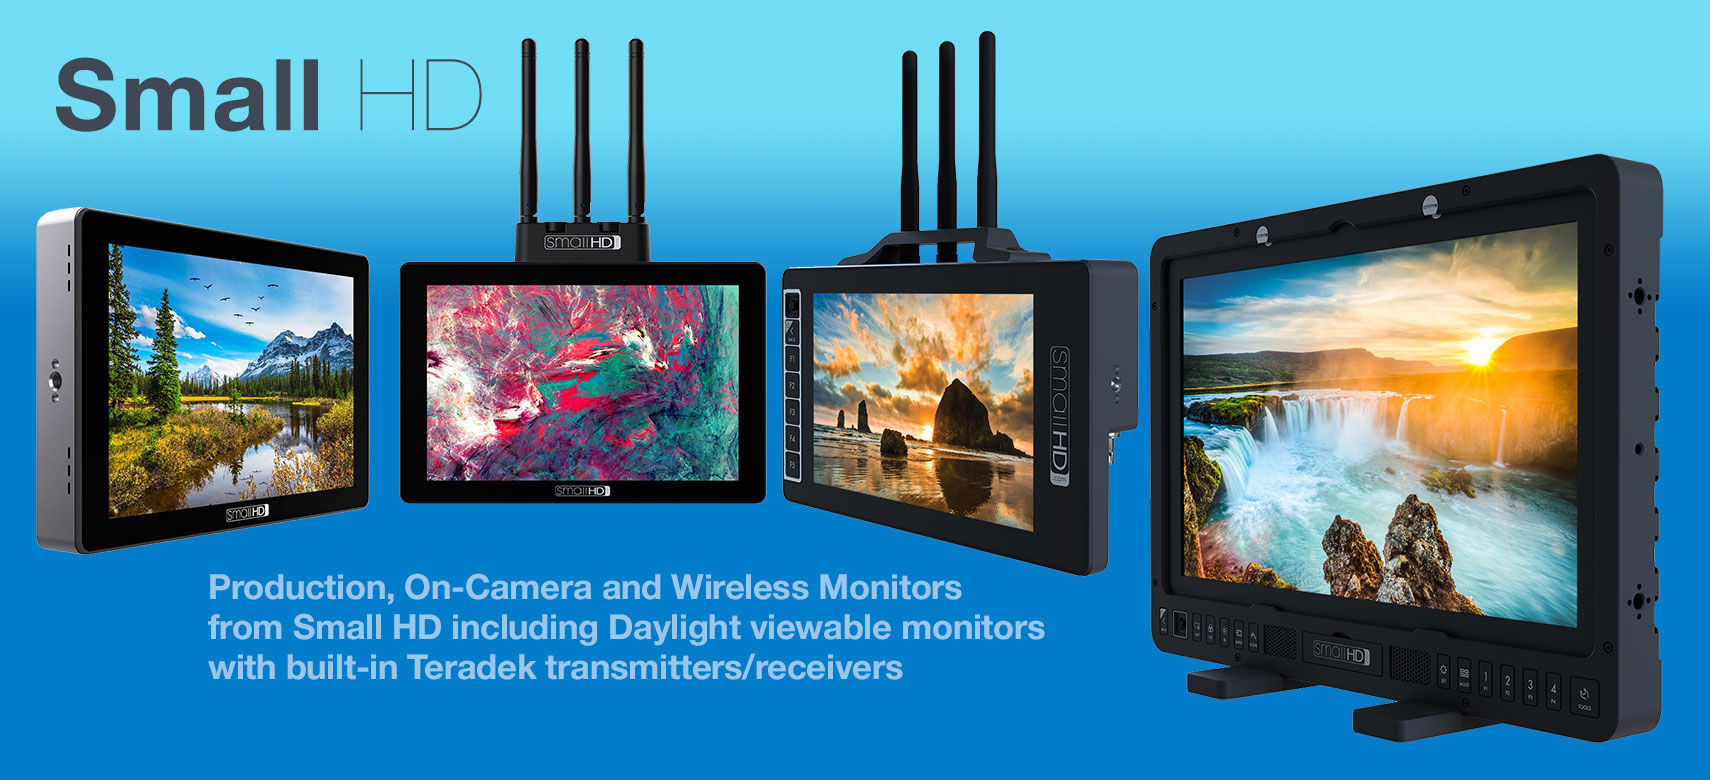 Small HD Monitors